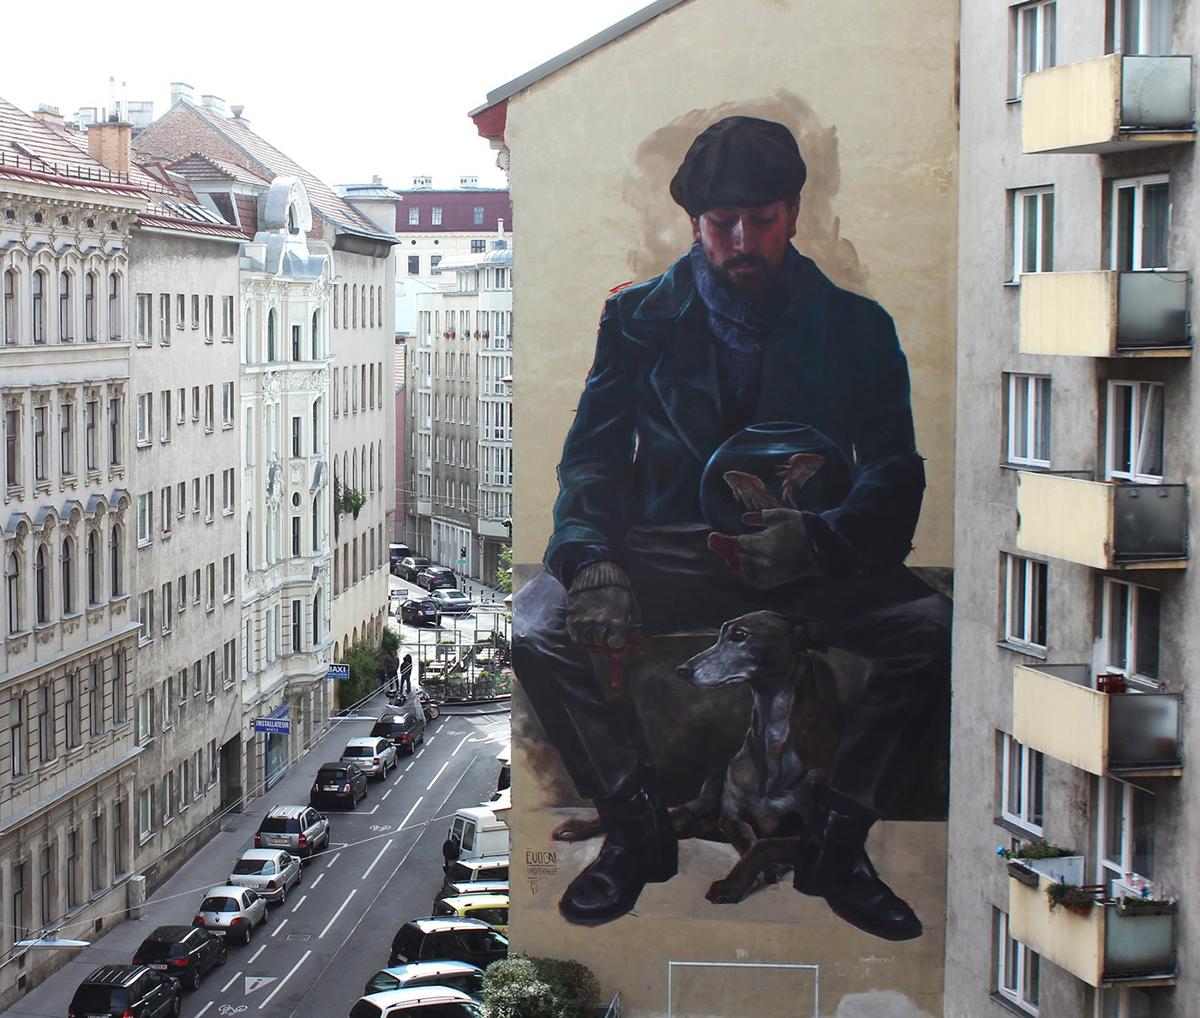 evoca1-new-mural-in-vienna-02